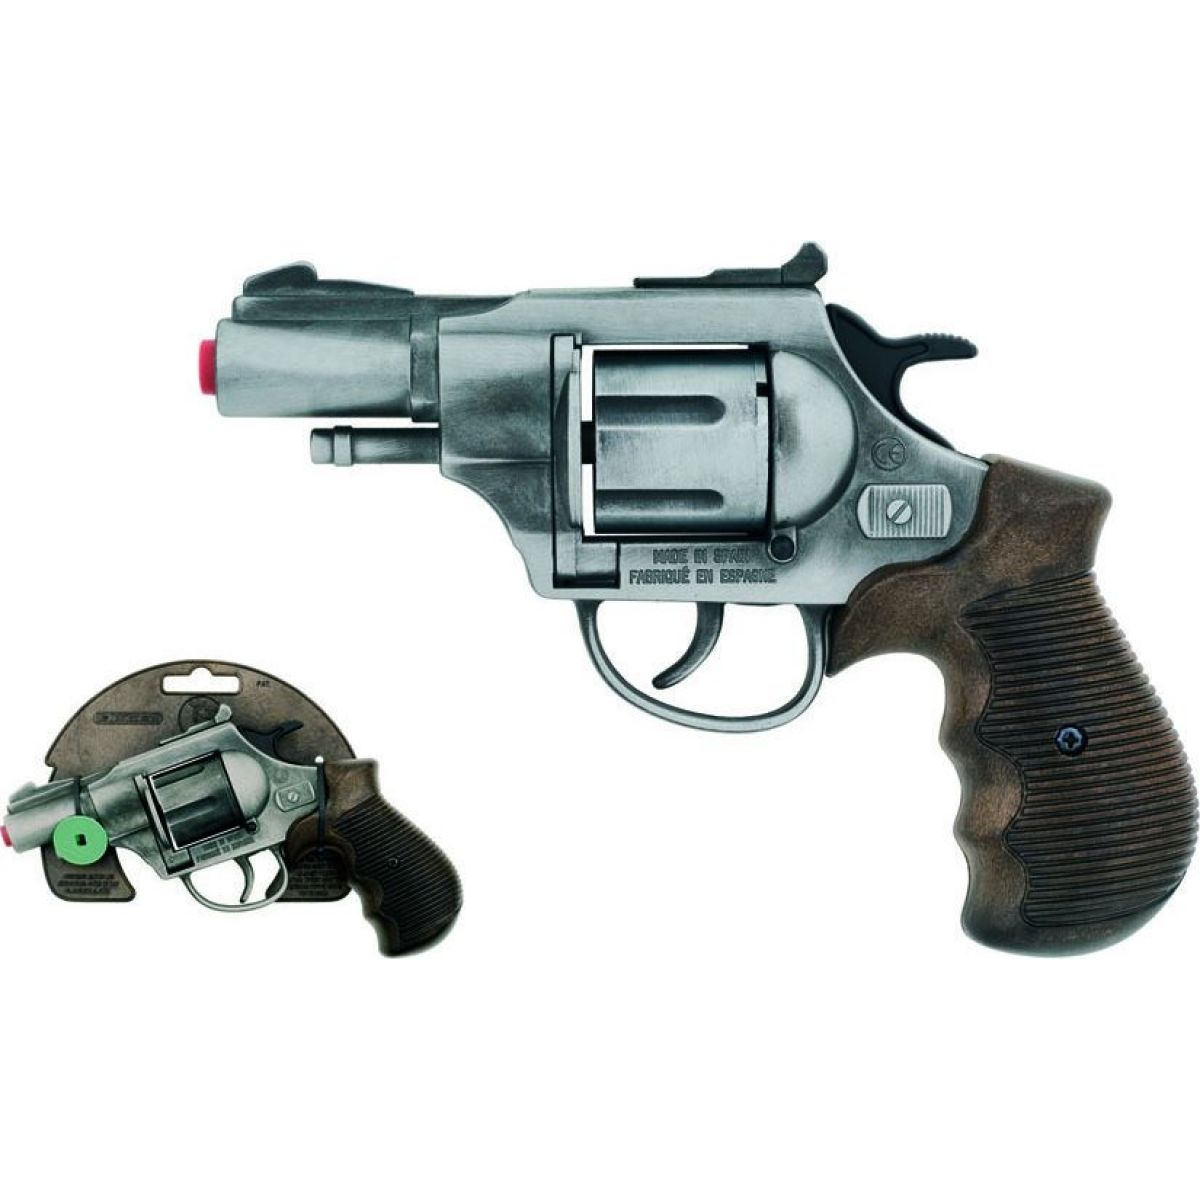 Alltoys Policejní revolver Gold 12 ran